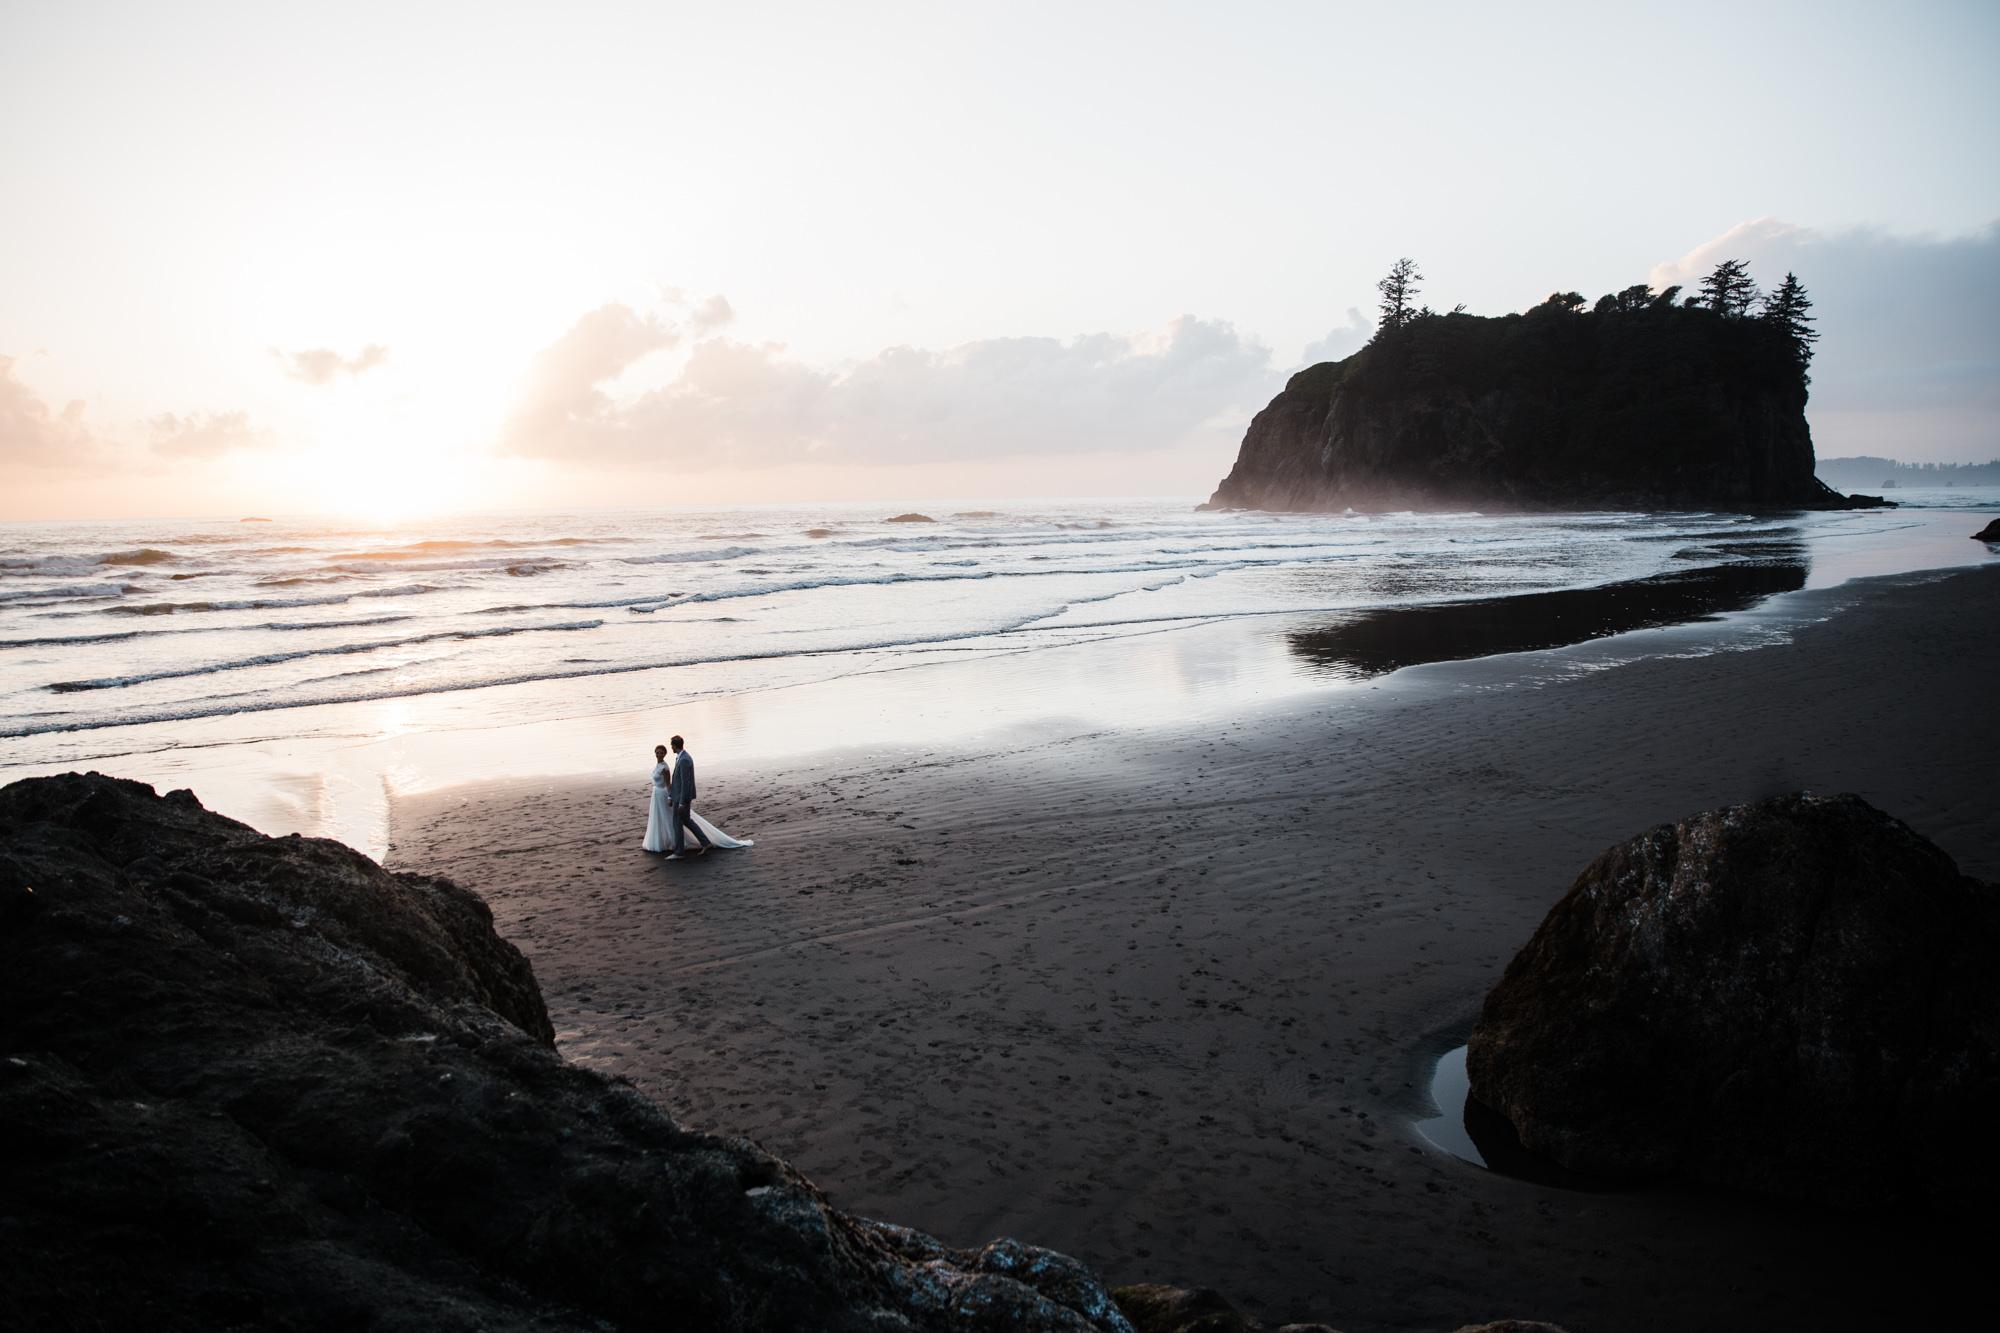 ruby beach olympic national park intimate wedding | destination adventure wedding photographers | the hearnes adventure photography | www.thehearnes.com